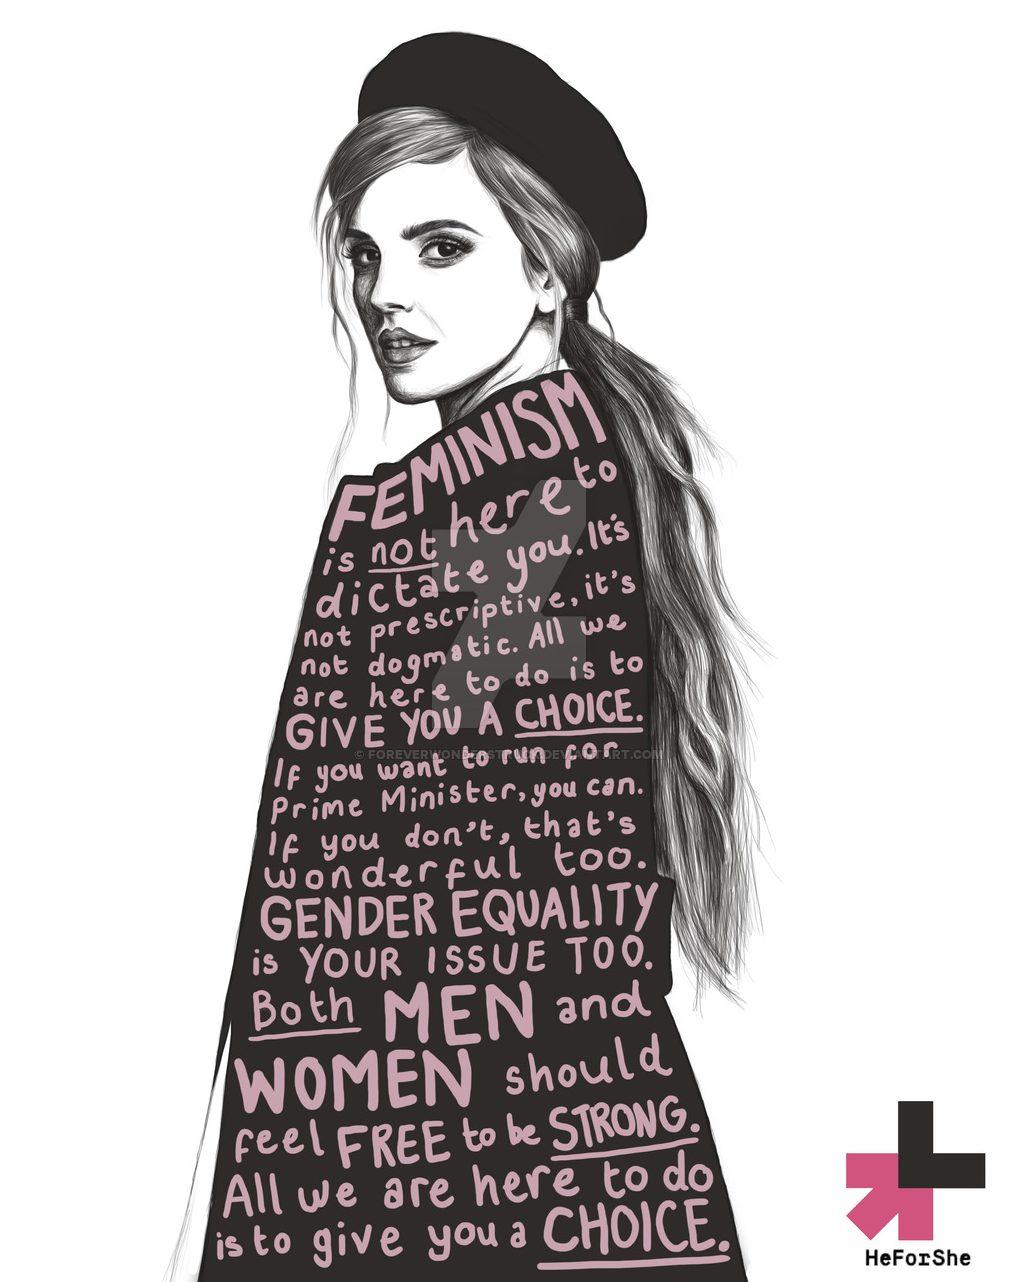 Women Empowering Women - Emma Watson - HeforShe Emma Watson Illustration by Foreverwonderstruck - women empowerment - feminism - famous feminists